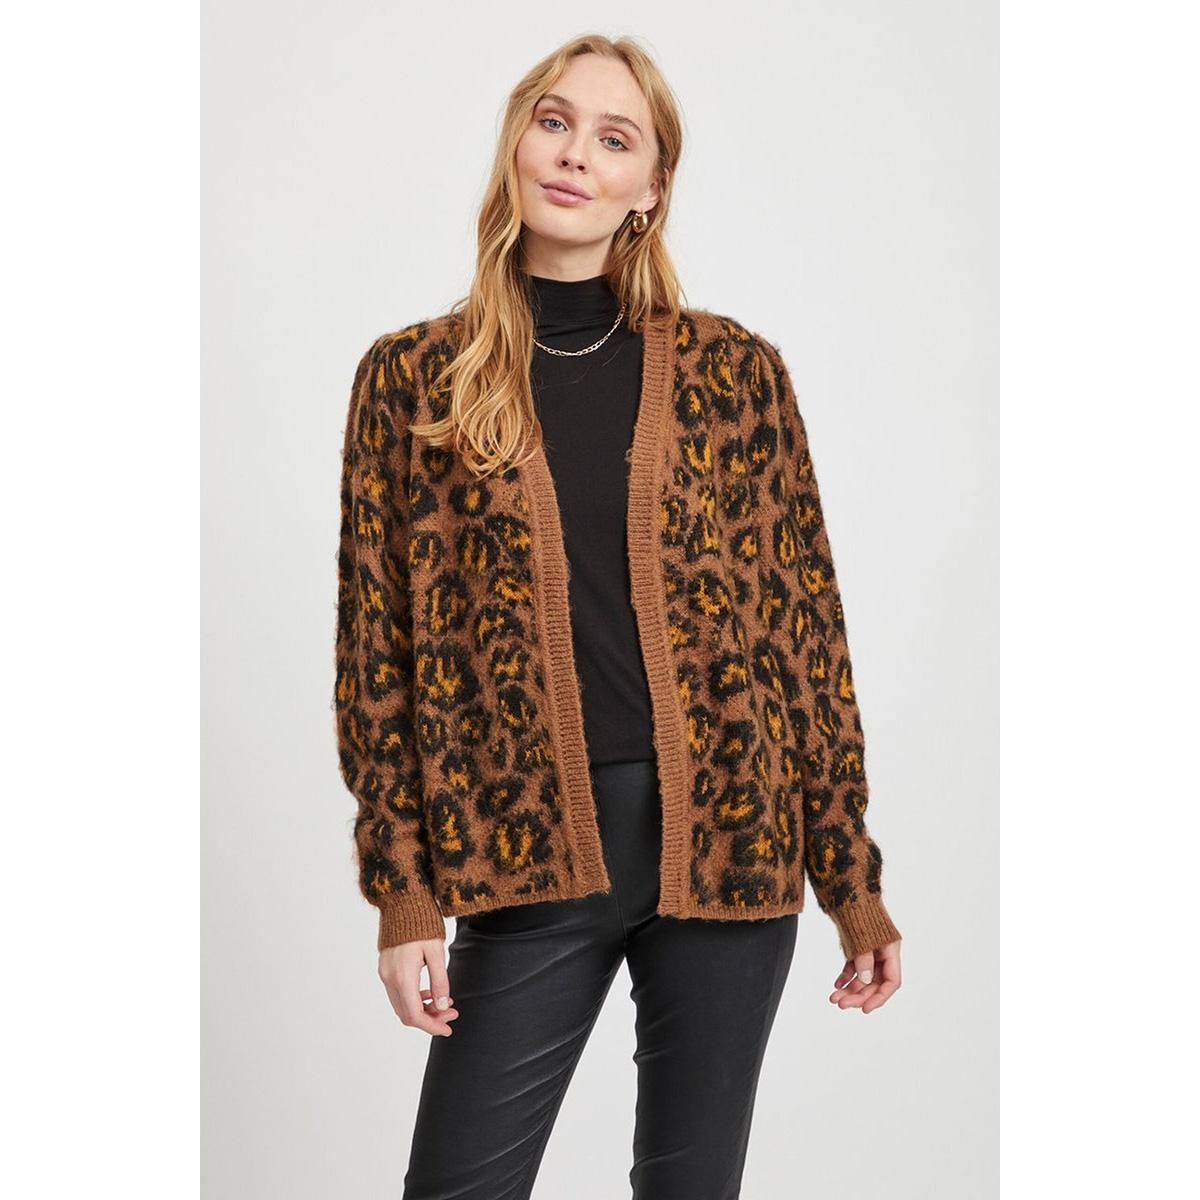 vivild knit l/s cardigan 14053297 vila vest toffee/golden oak